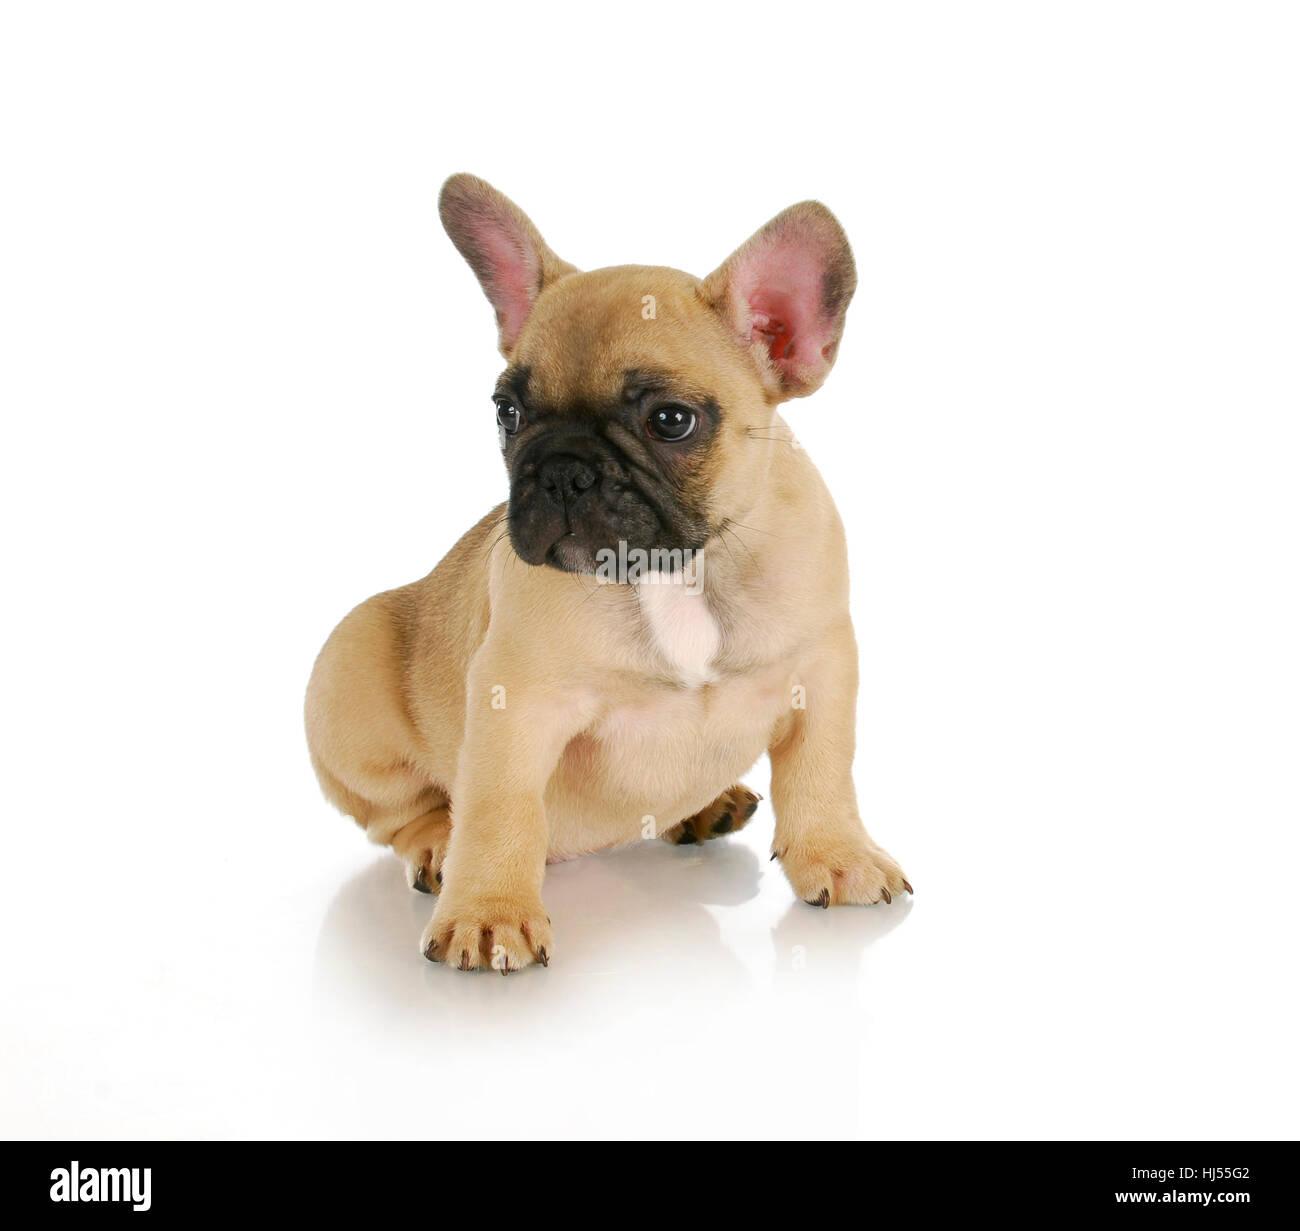 Cute Puppy French Bulldog Sitting On White Background 8 Weeks